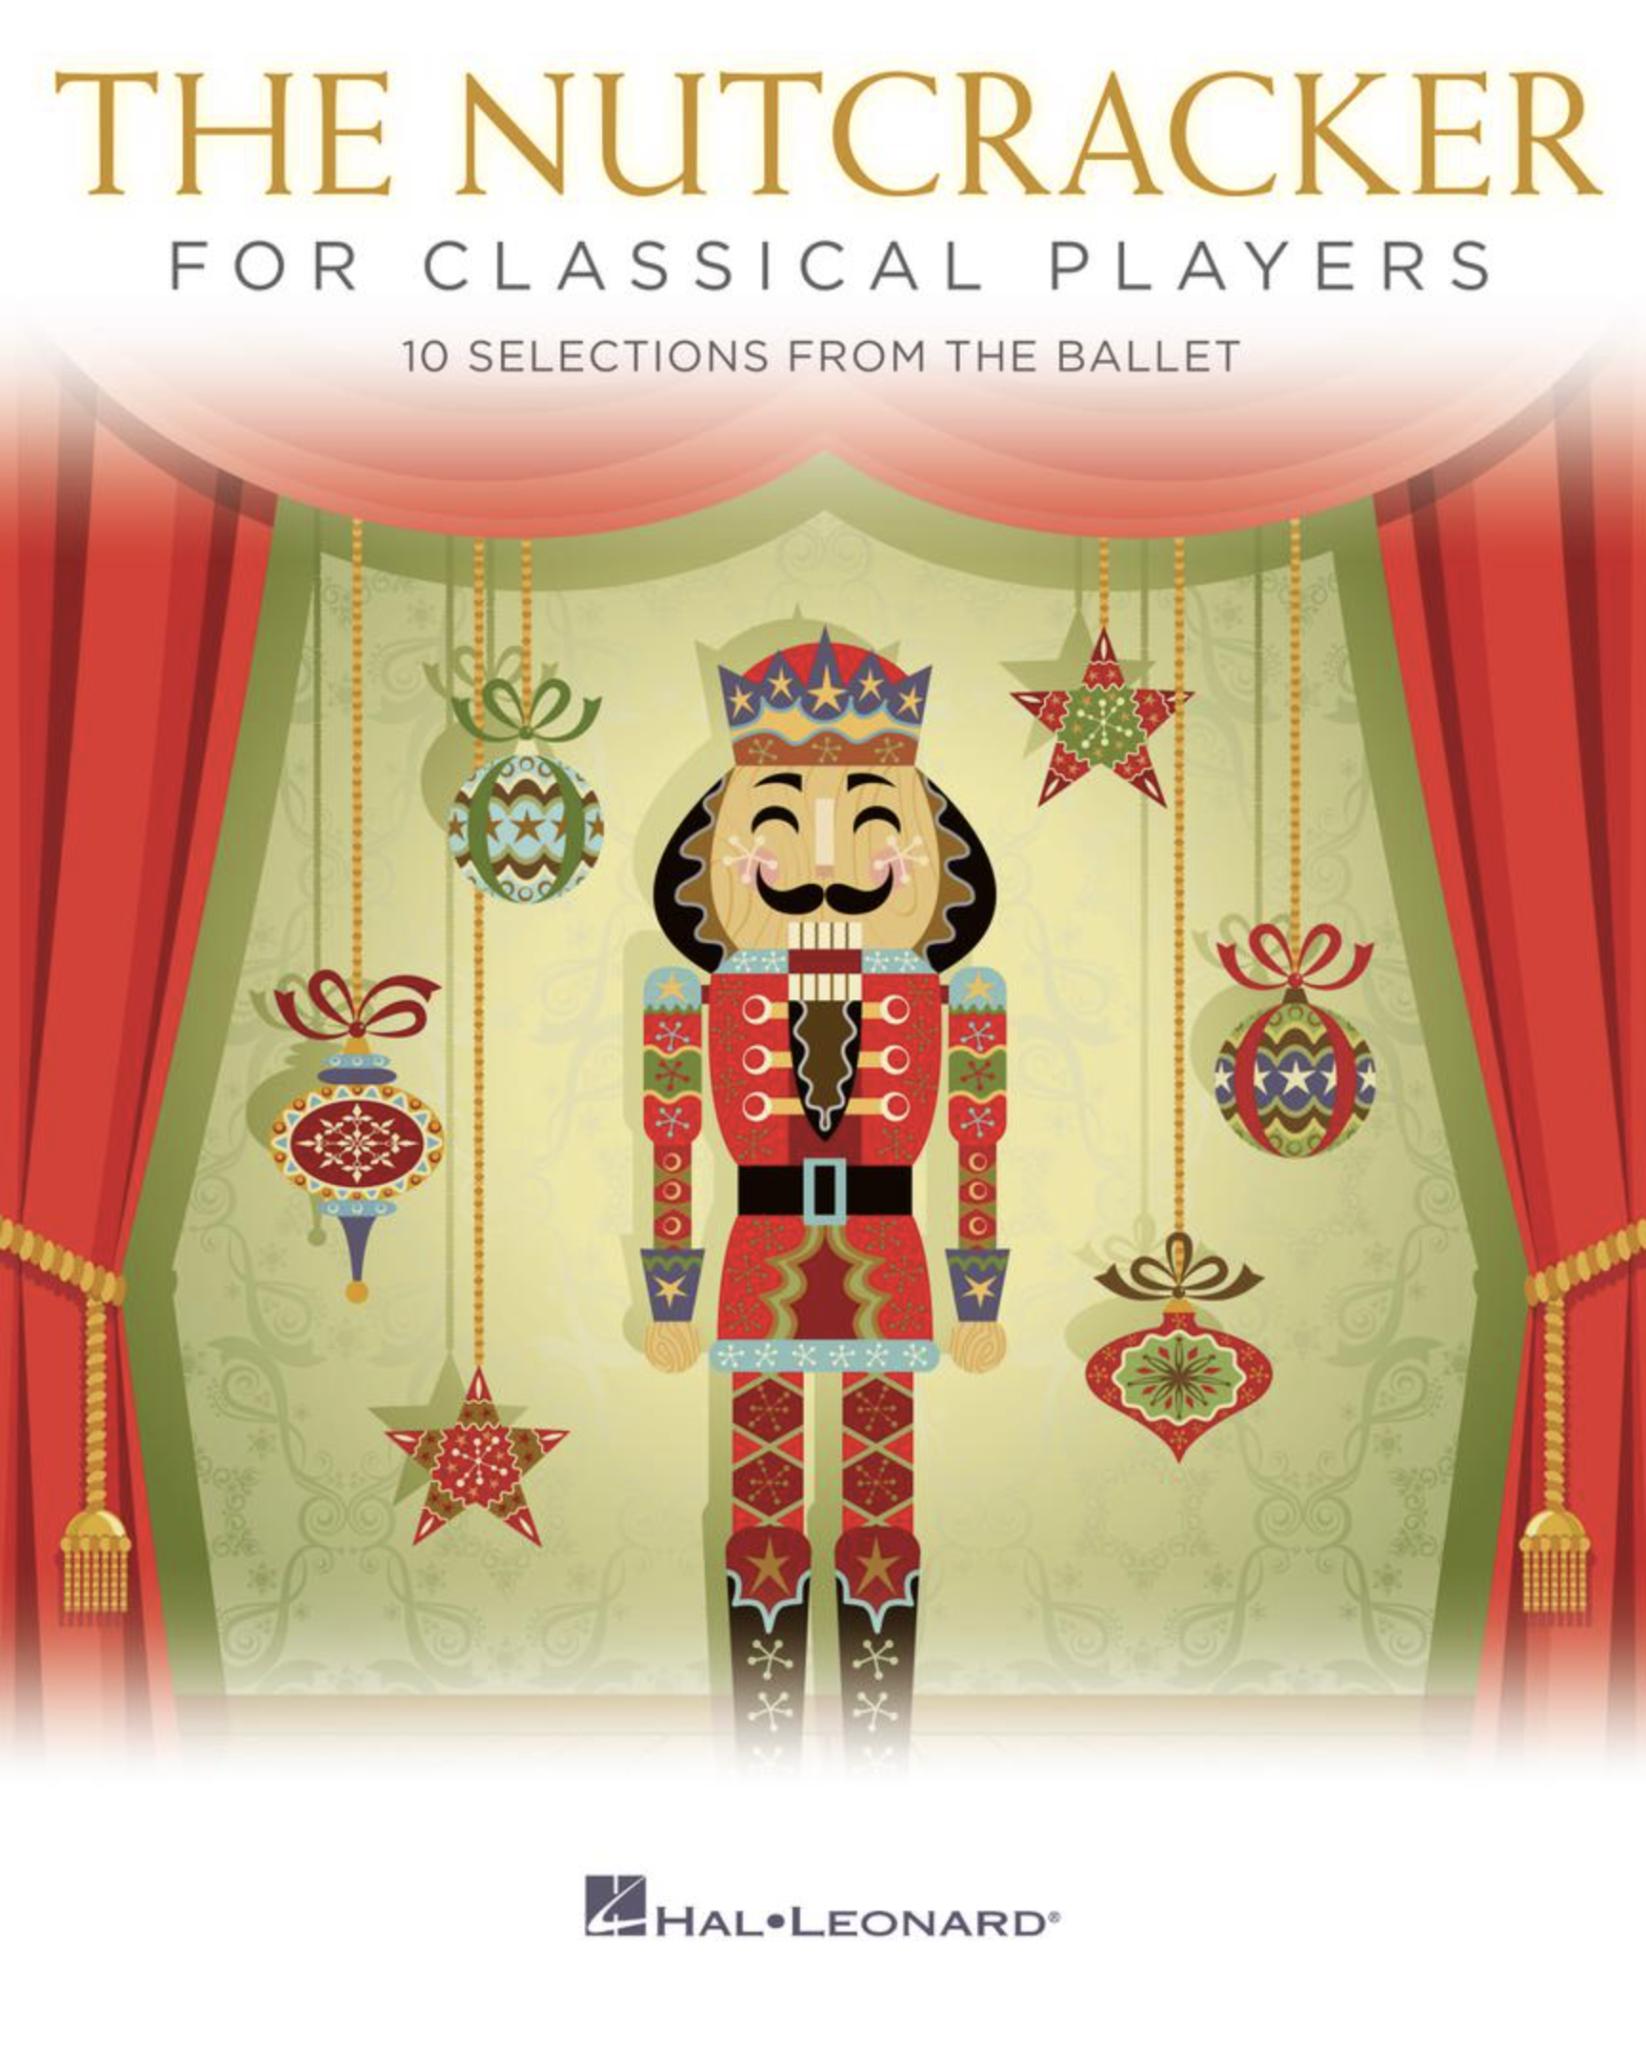 HAL LEONARD Tchaikovsky: The Nutcracker (cello and piano) Hal Leonard